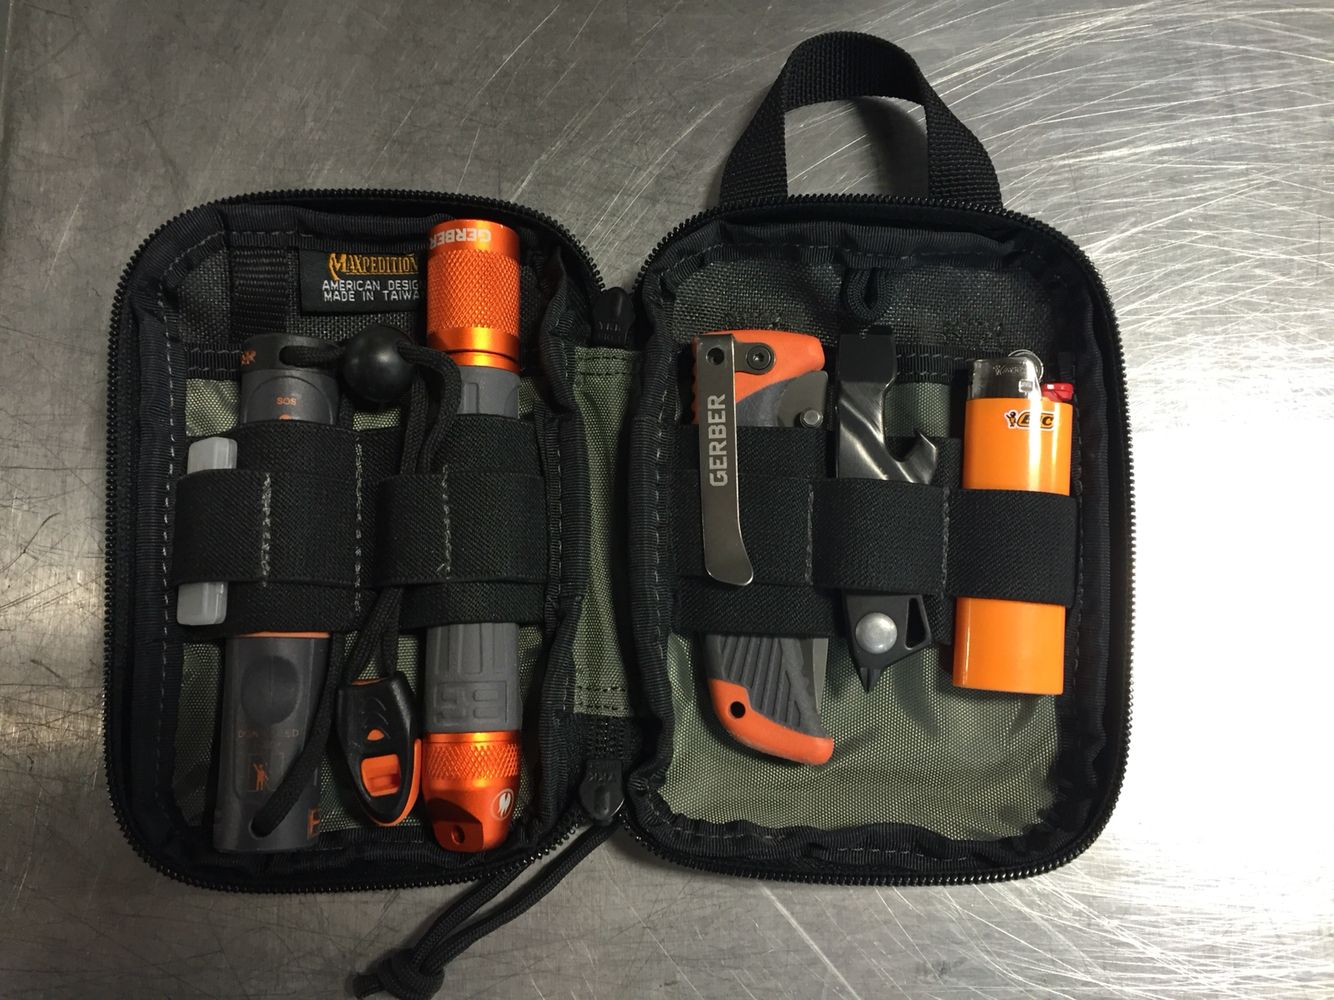 Compact Camping Survival Kit